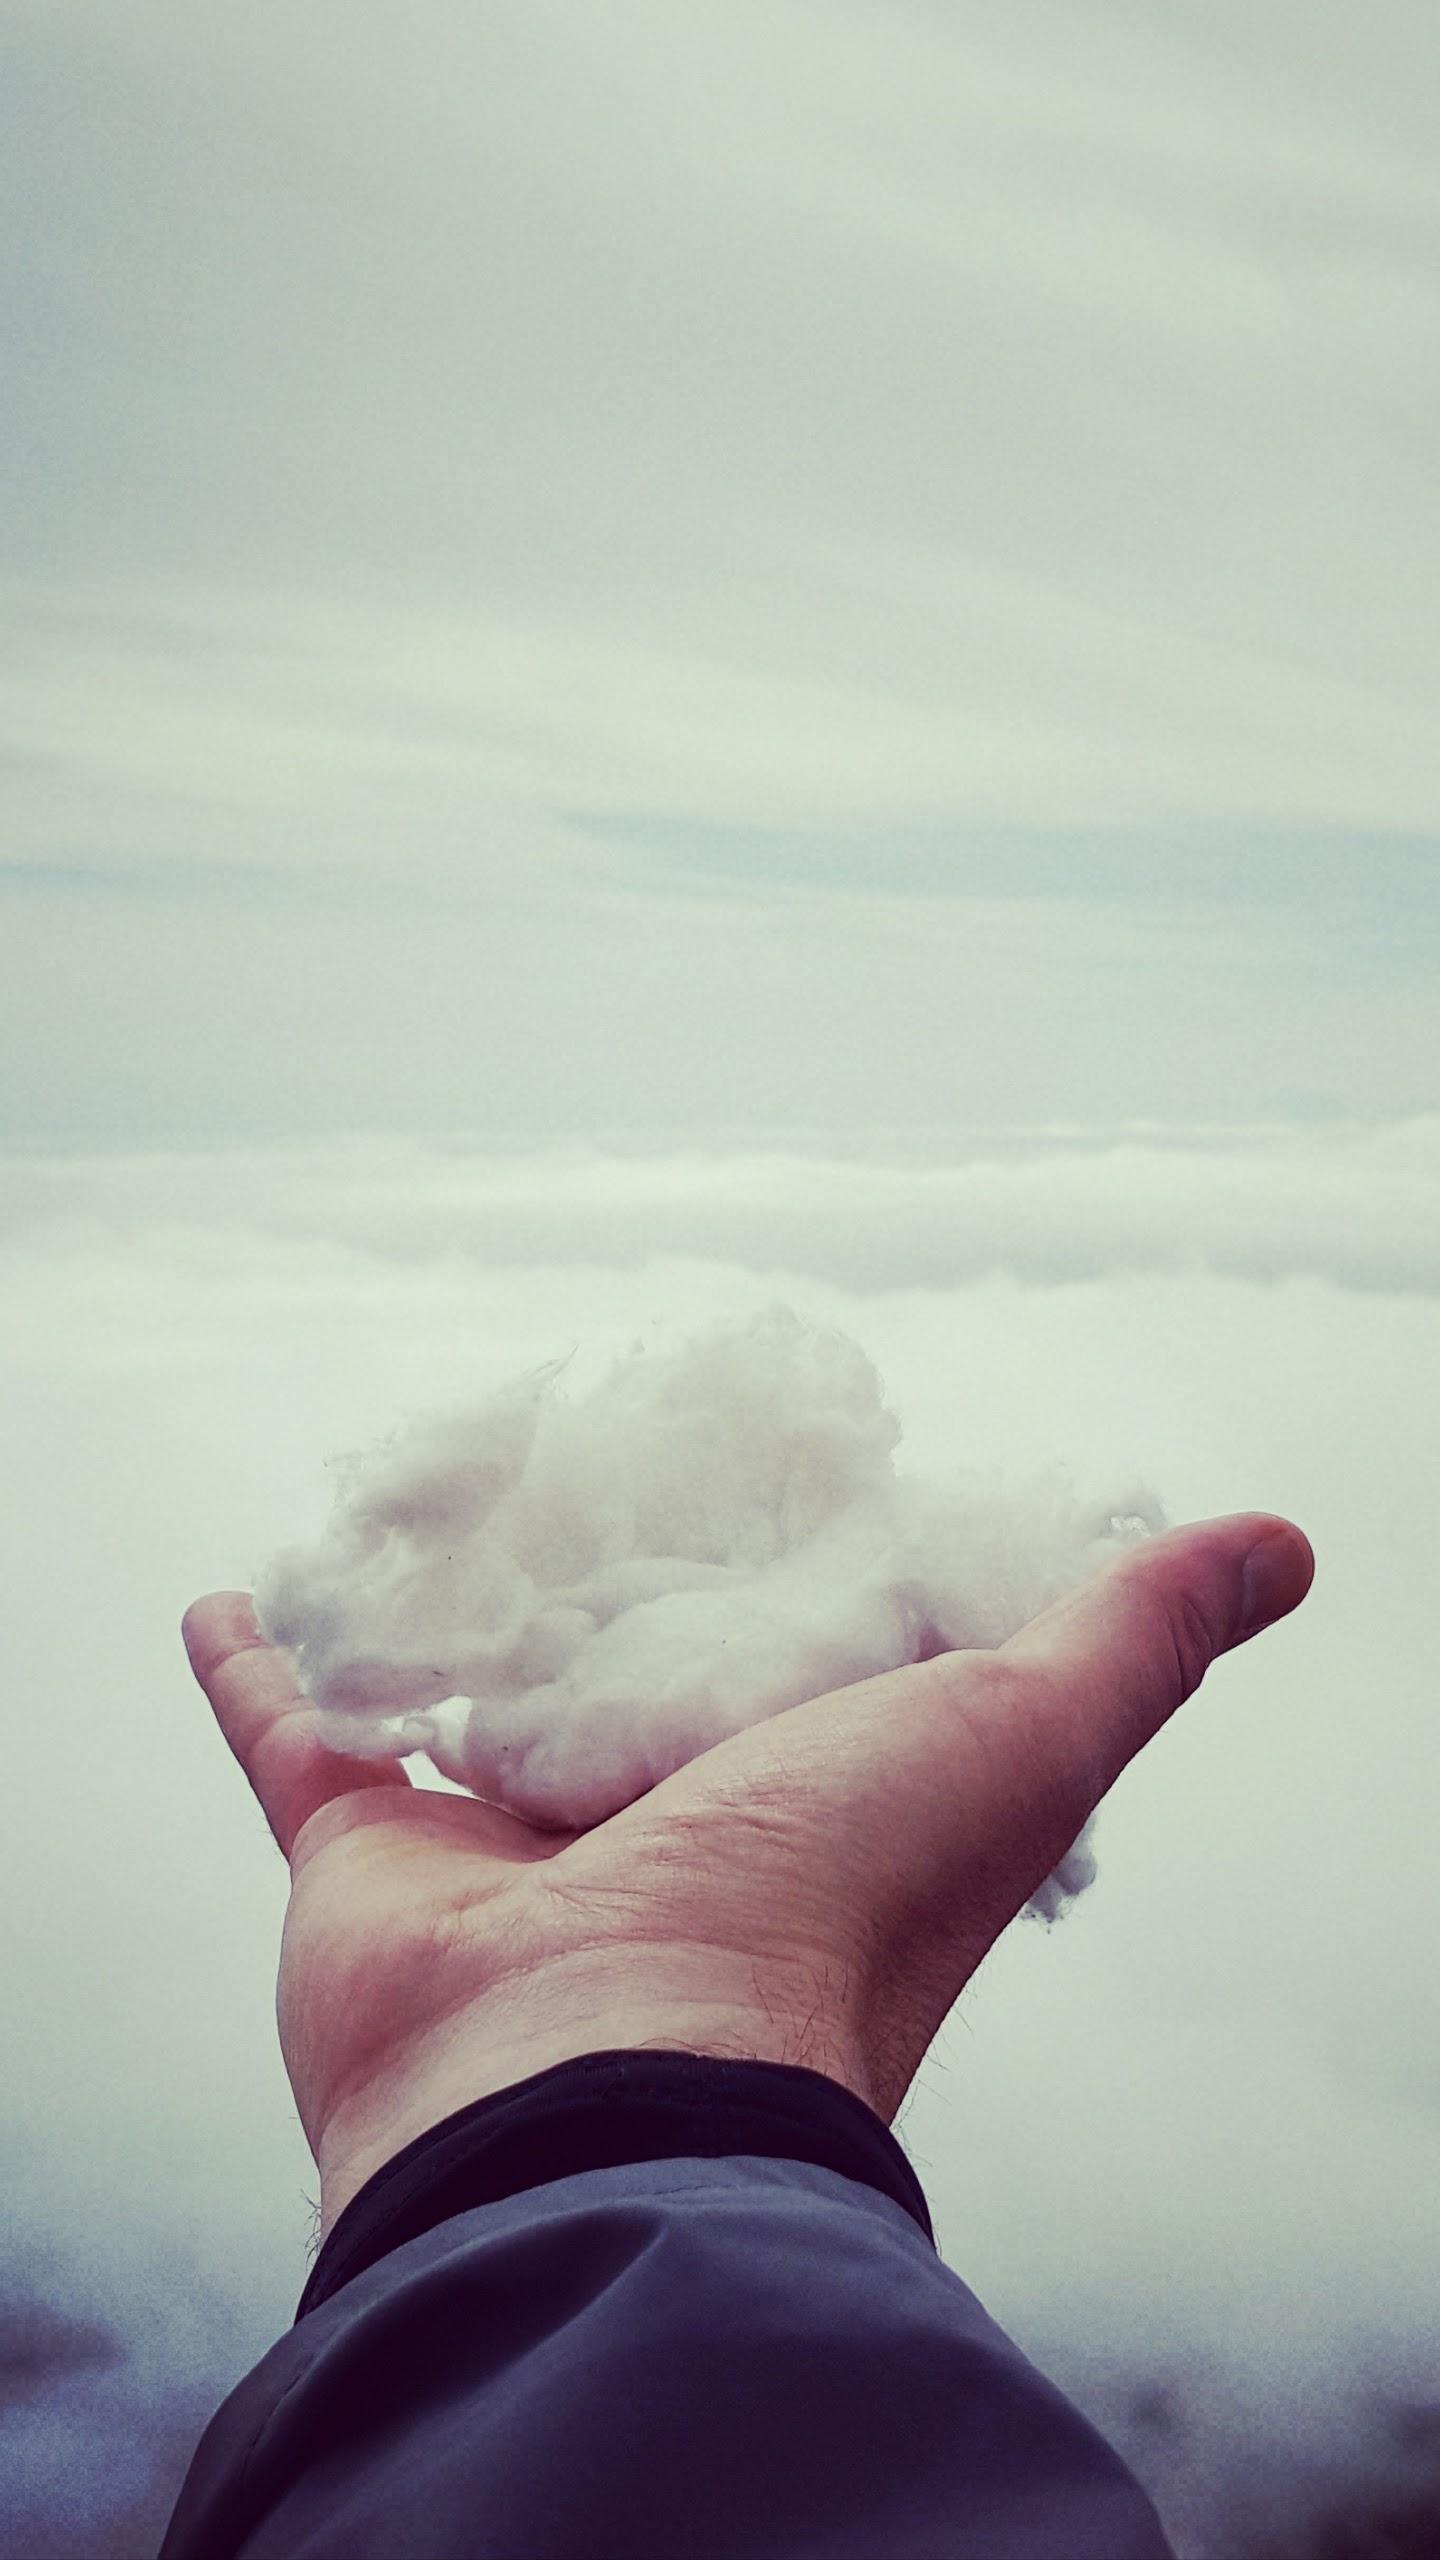 Demystifying the Cloud Alternative